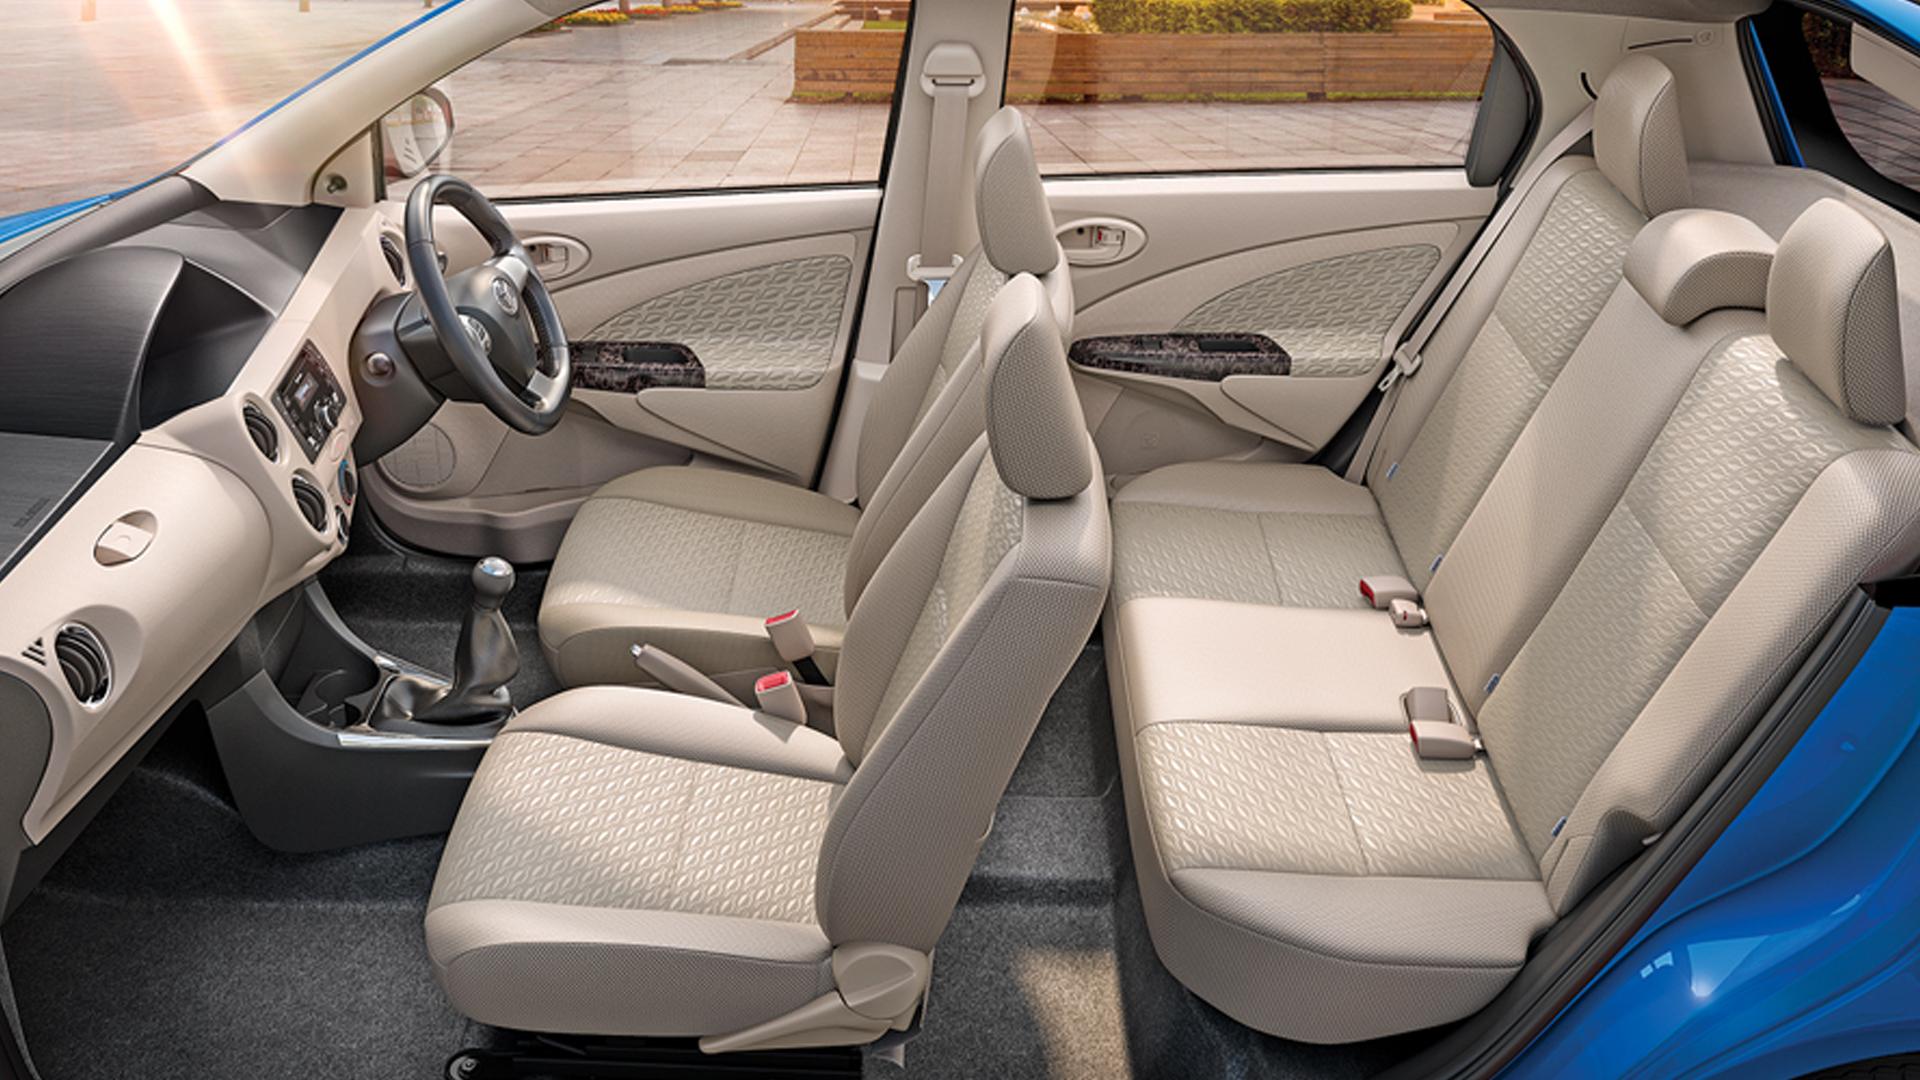 Toyota Etios Liva 2016 VXD Exterior